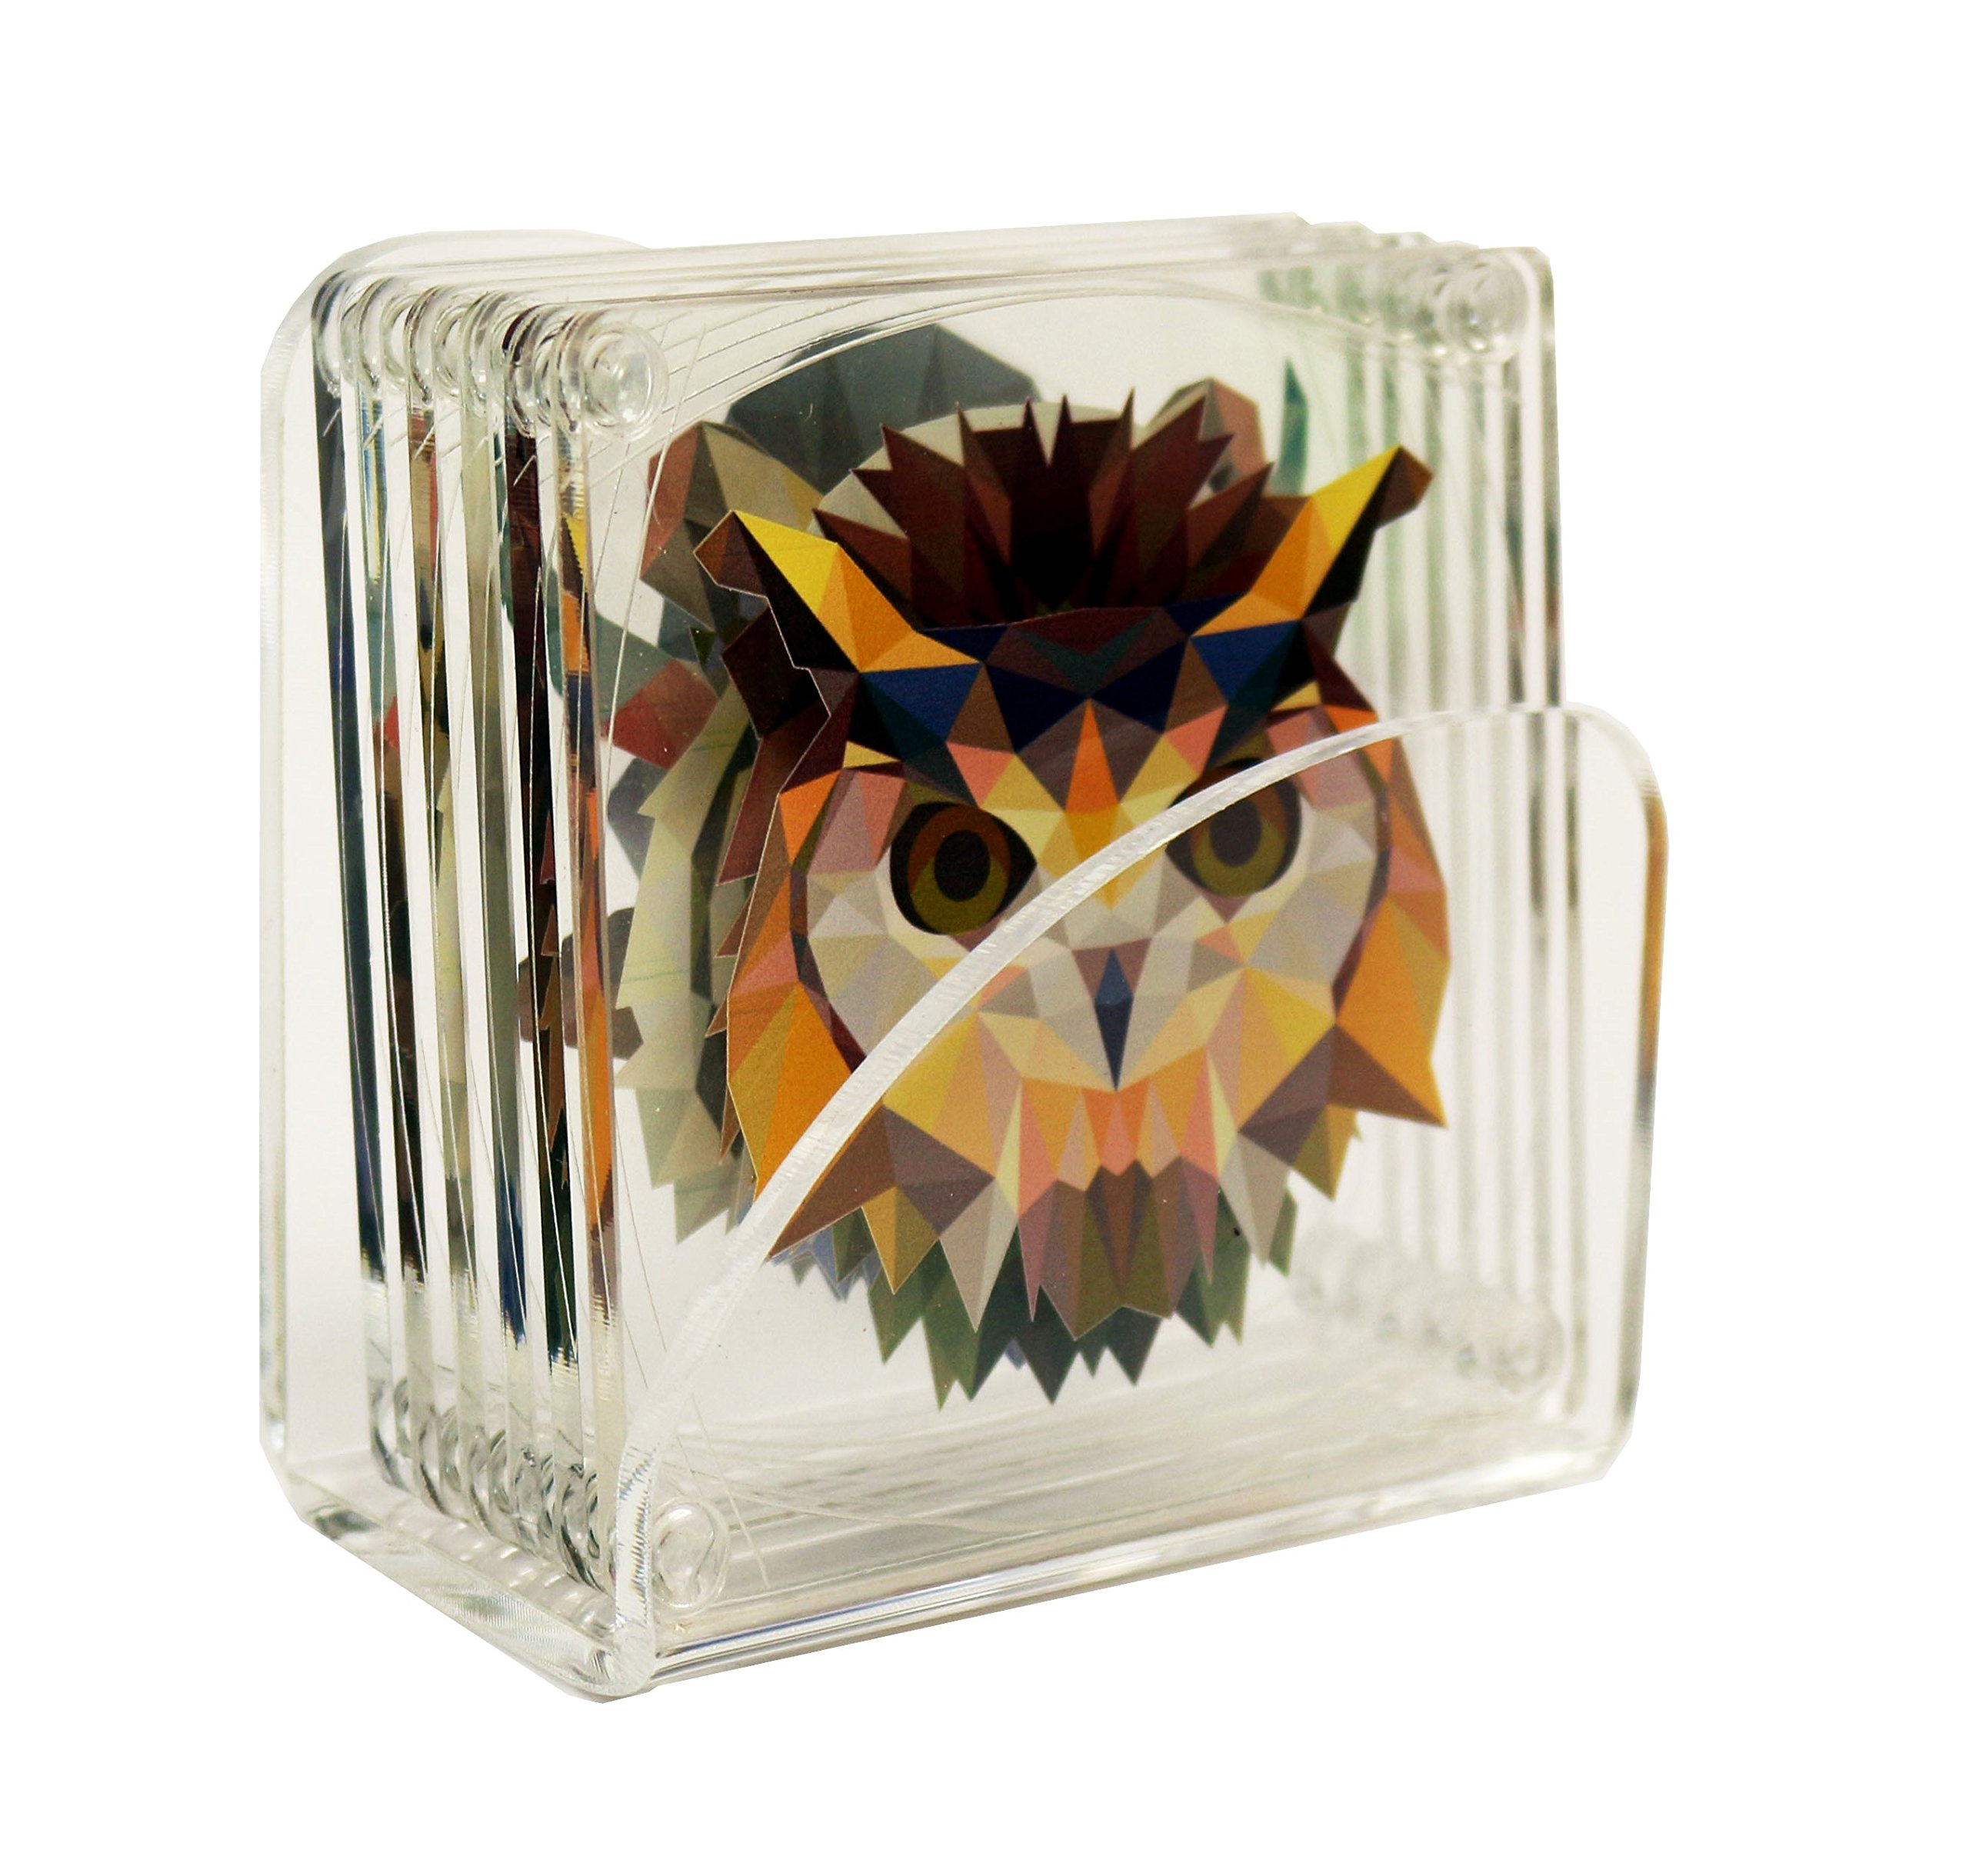 Idea Design - Acrylic 3.5'' Assorted Coasters: Owl, Eagle, Lion, Gorilla, Buffalo and Tiger - Safari Animals With Clear Acrylic Stand (Set of 6)